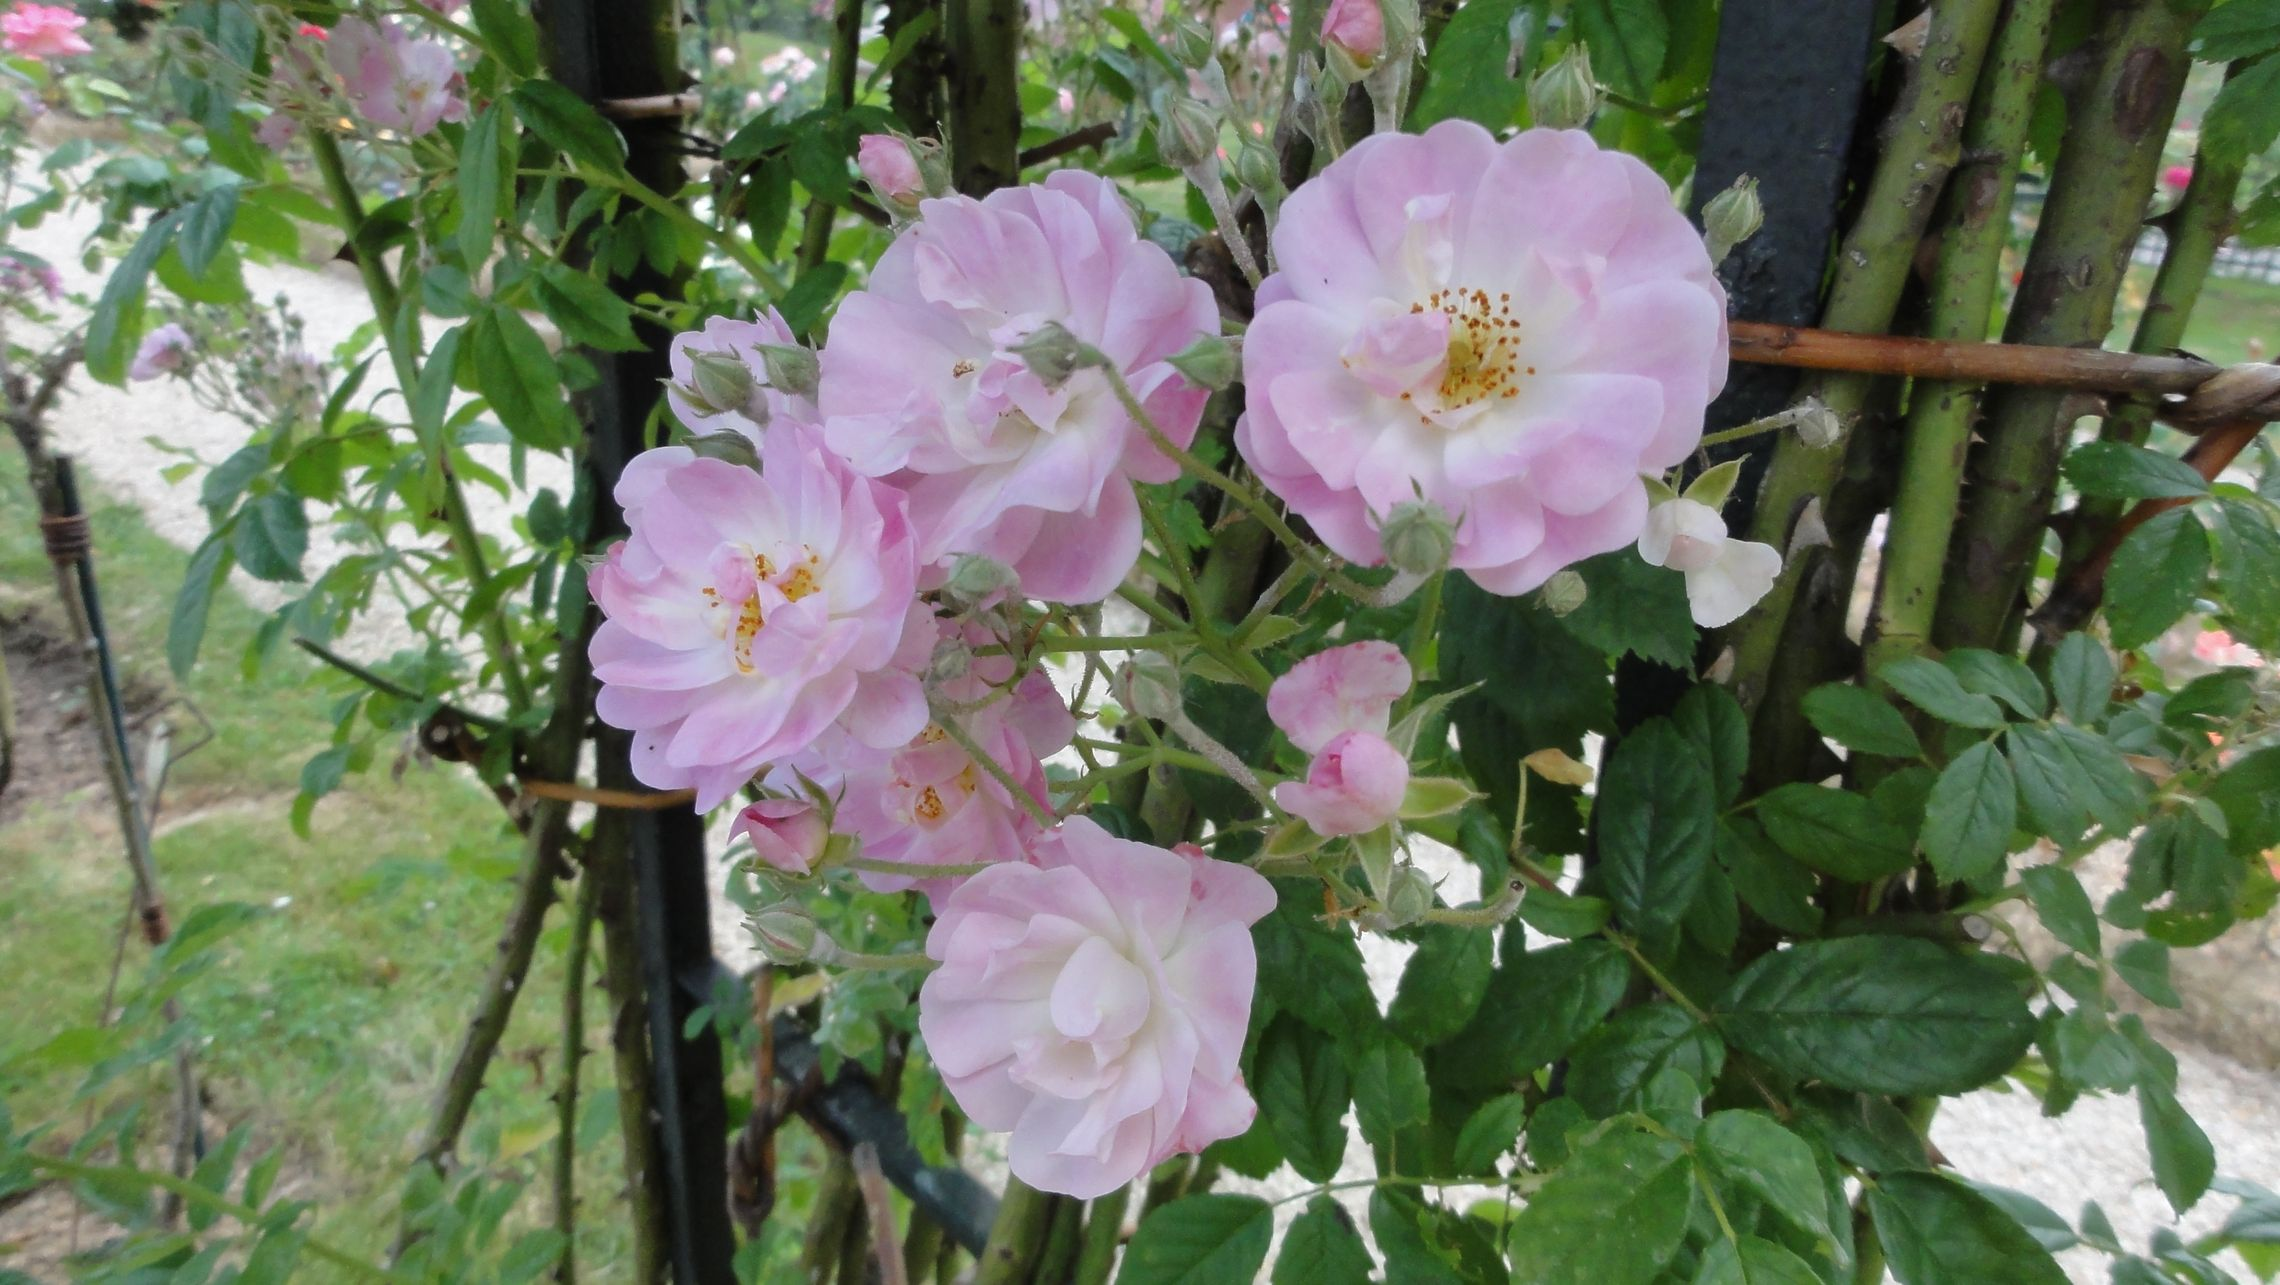 20170602 roseraie vdm 05